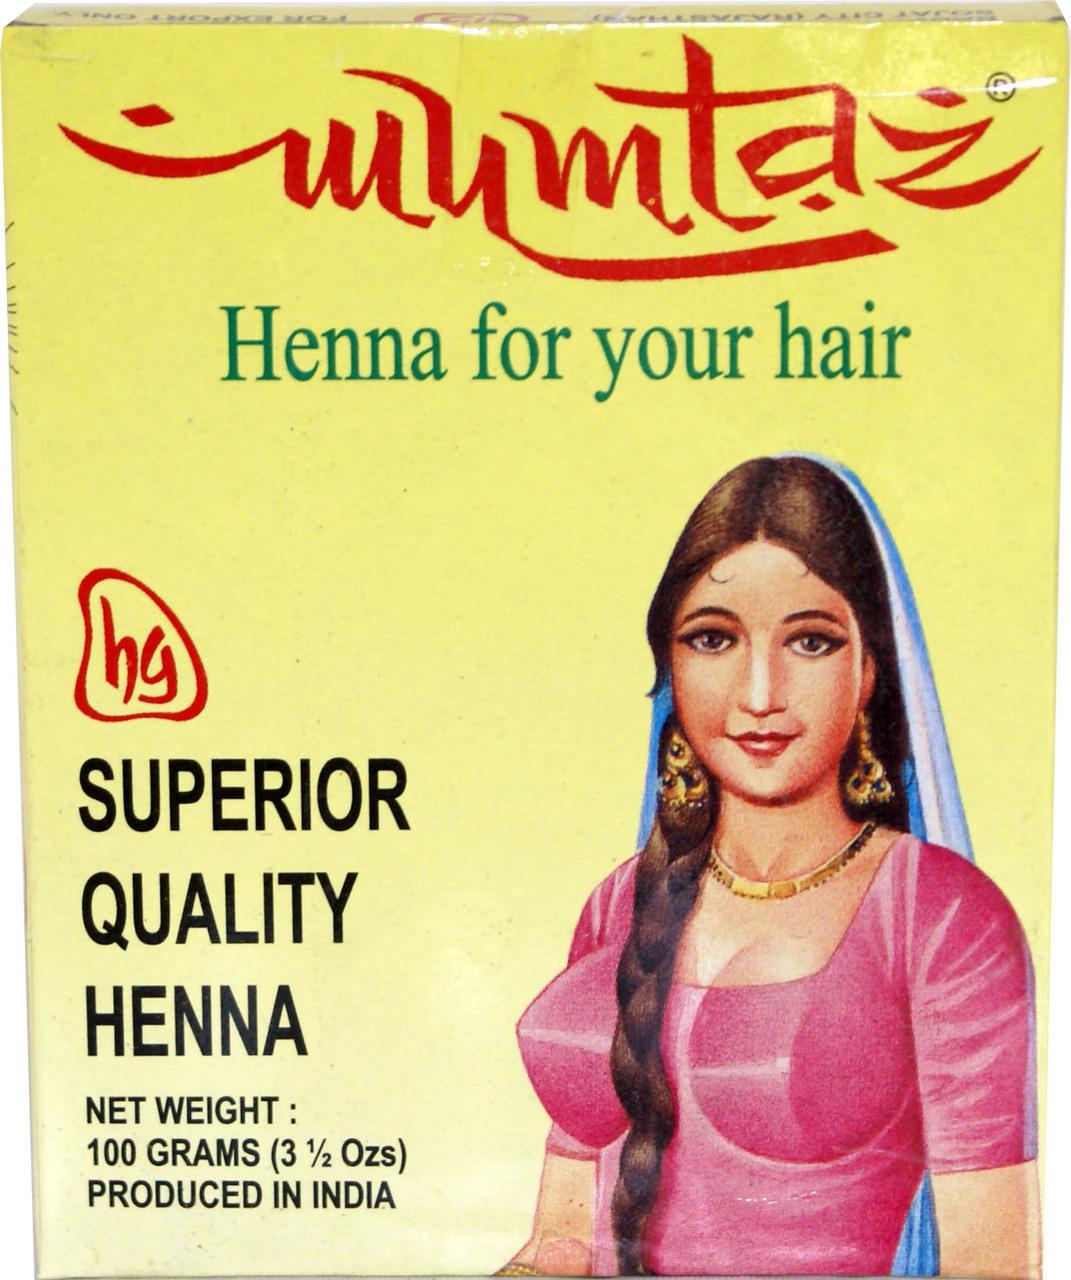 1ac87bd41 Mumtaz Henna – 100 g. – UrbanMakes